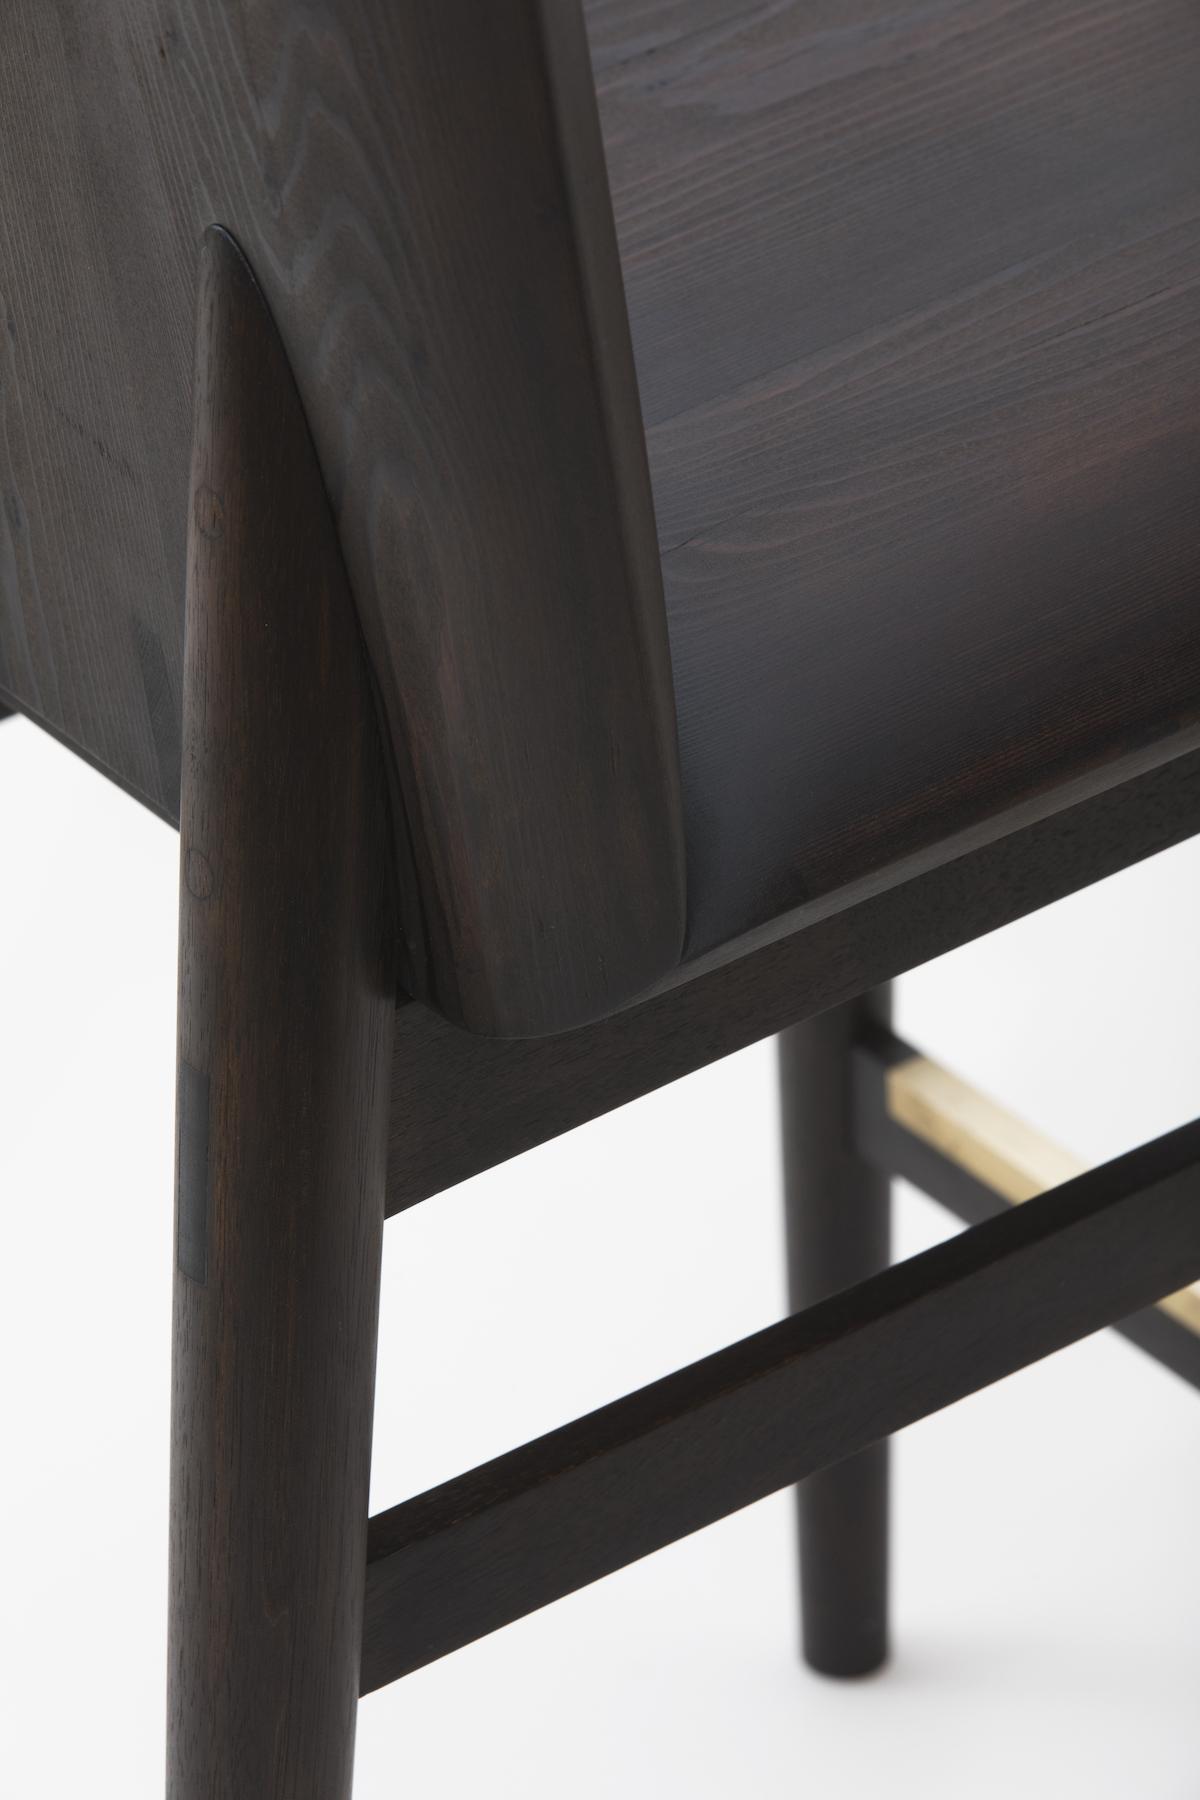 seat detail of the Redwood Bar/Counter Stool by artist Christopher Kurtz